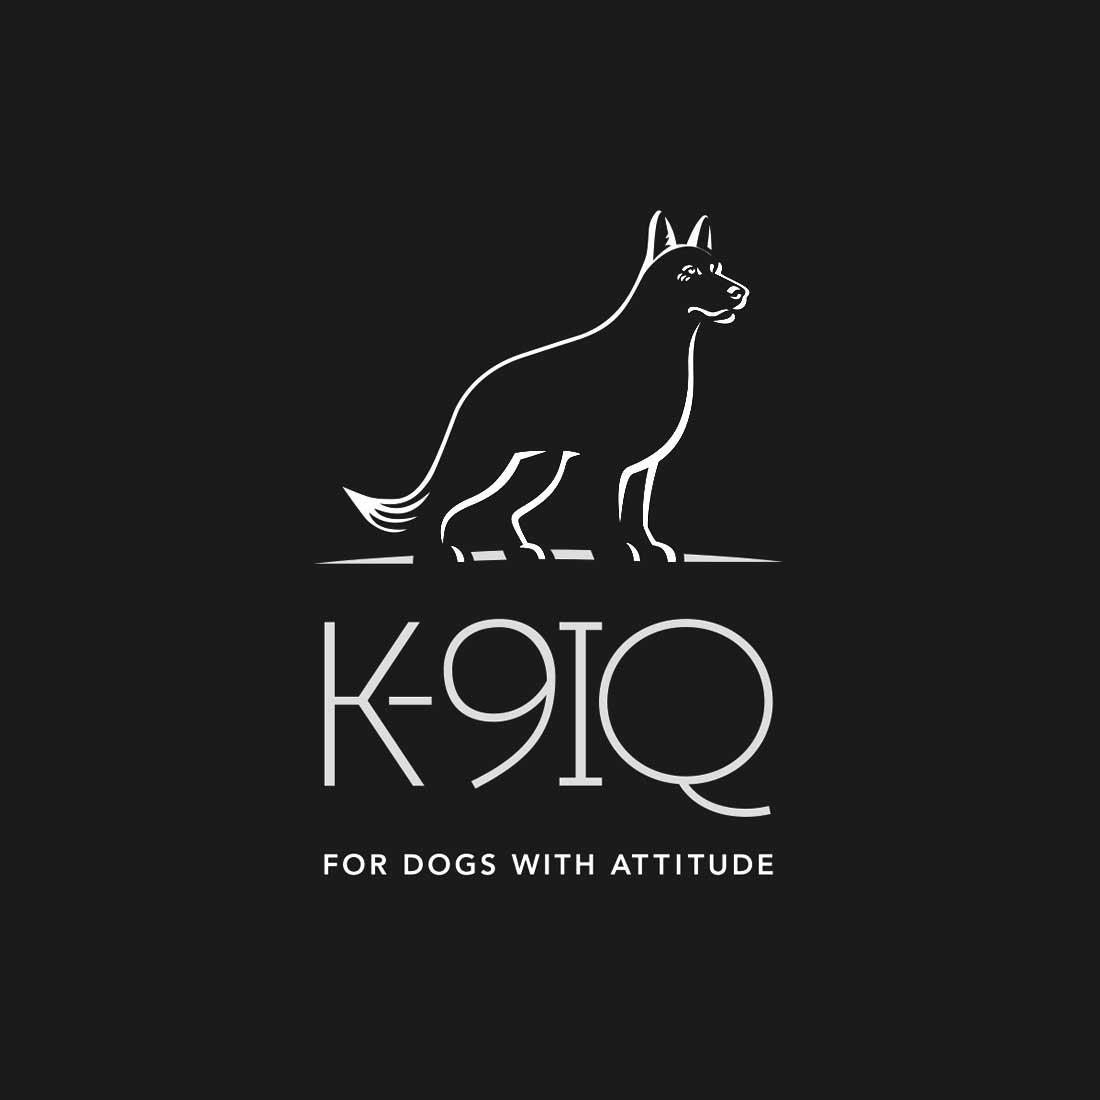 K9IQ logo design on black background